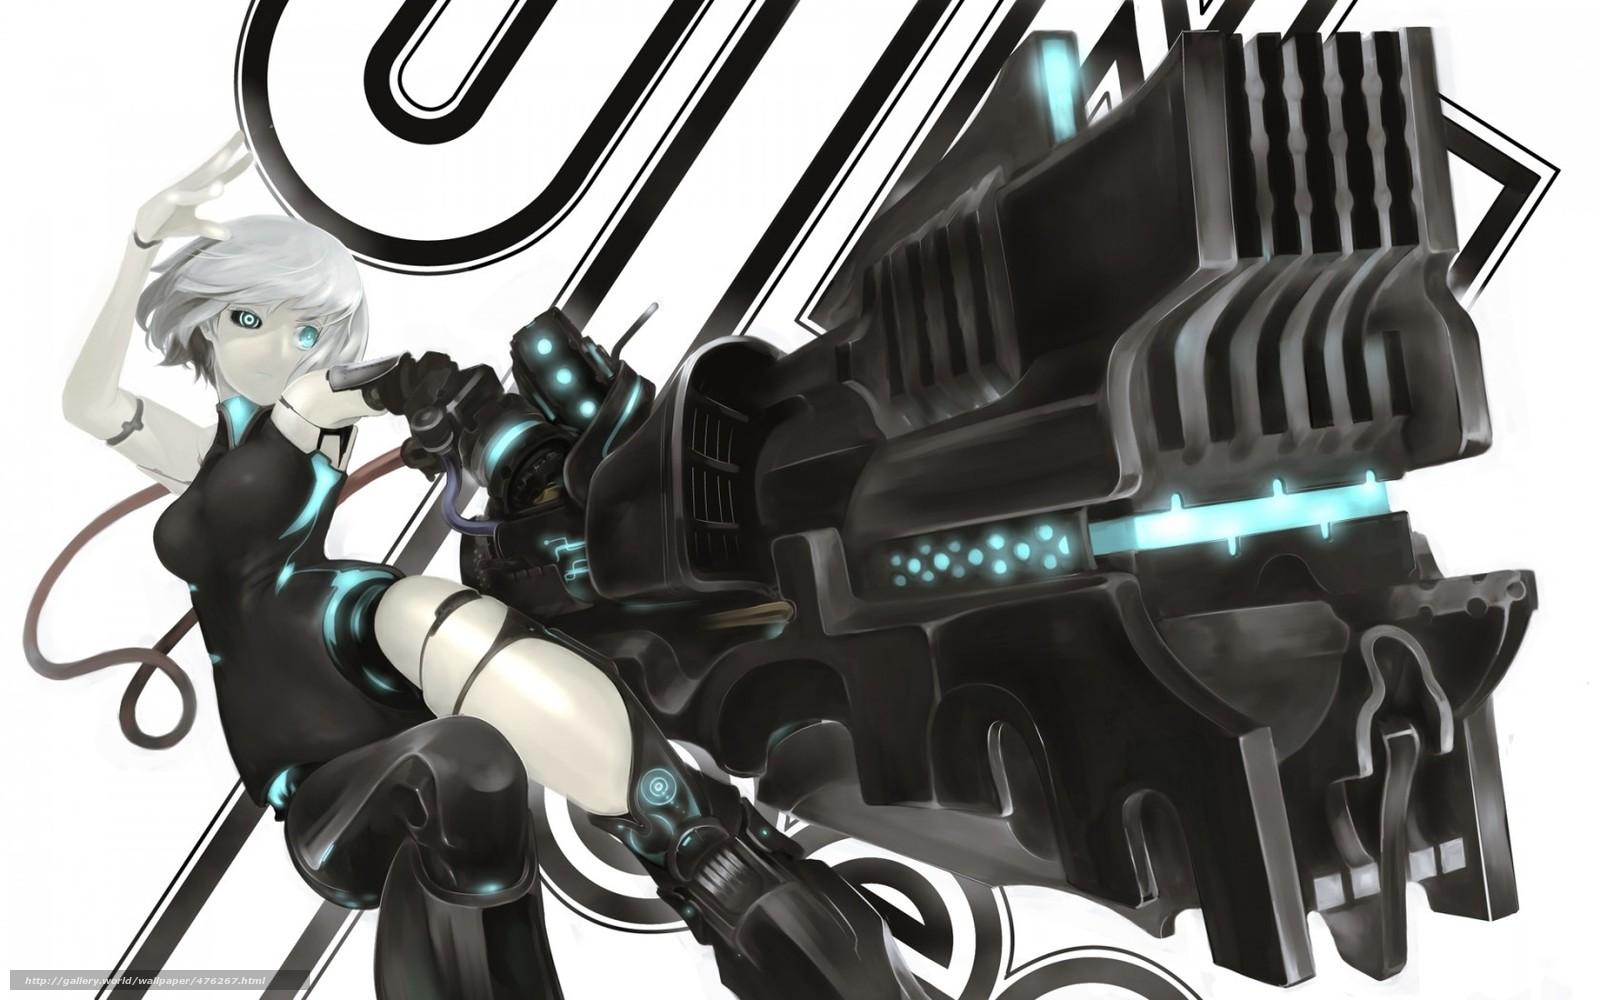 Download wallpaper Art,  girl,  weapon,  gun free desktop wallpaper in the resolution 1680x1050 — picture №476267